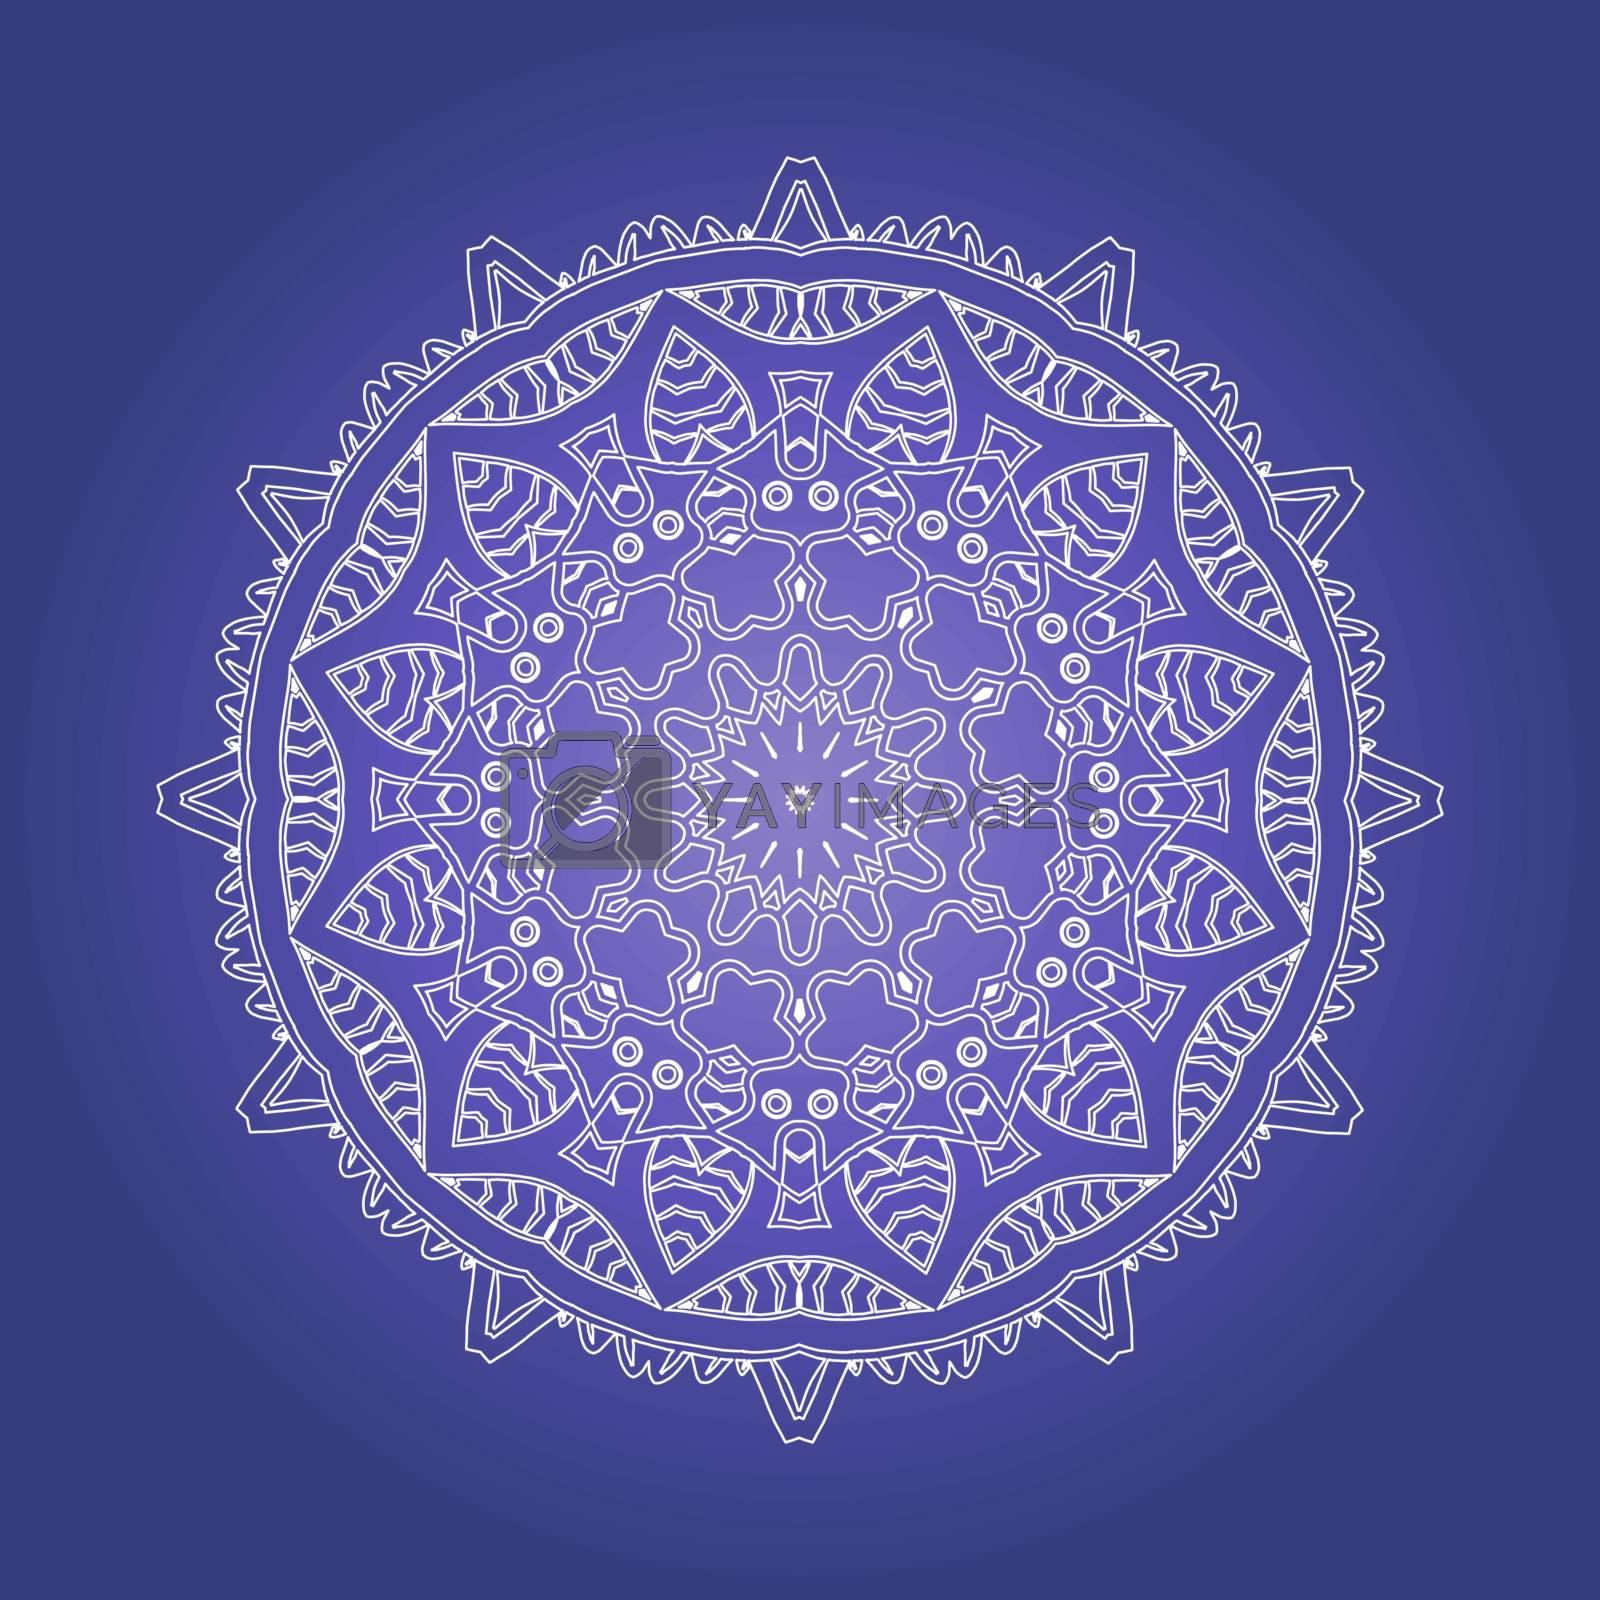 Ethnic Psychedelic Fractal Mandala Vector Meditation looks like Snowflake